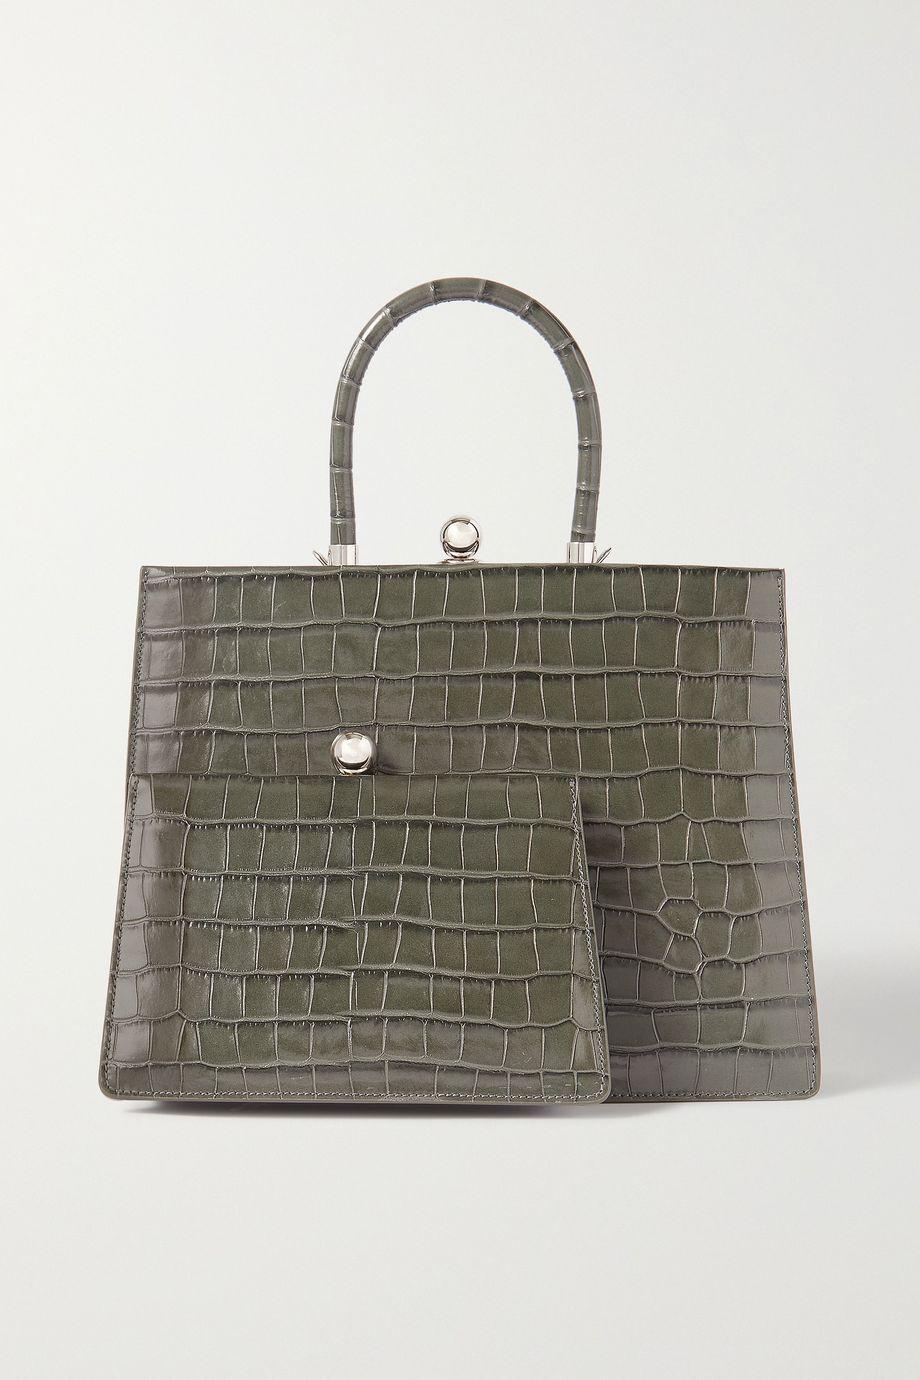 Ratio et Motus Twin Frame croc-effect leather tote